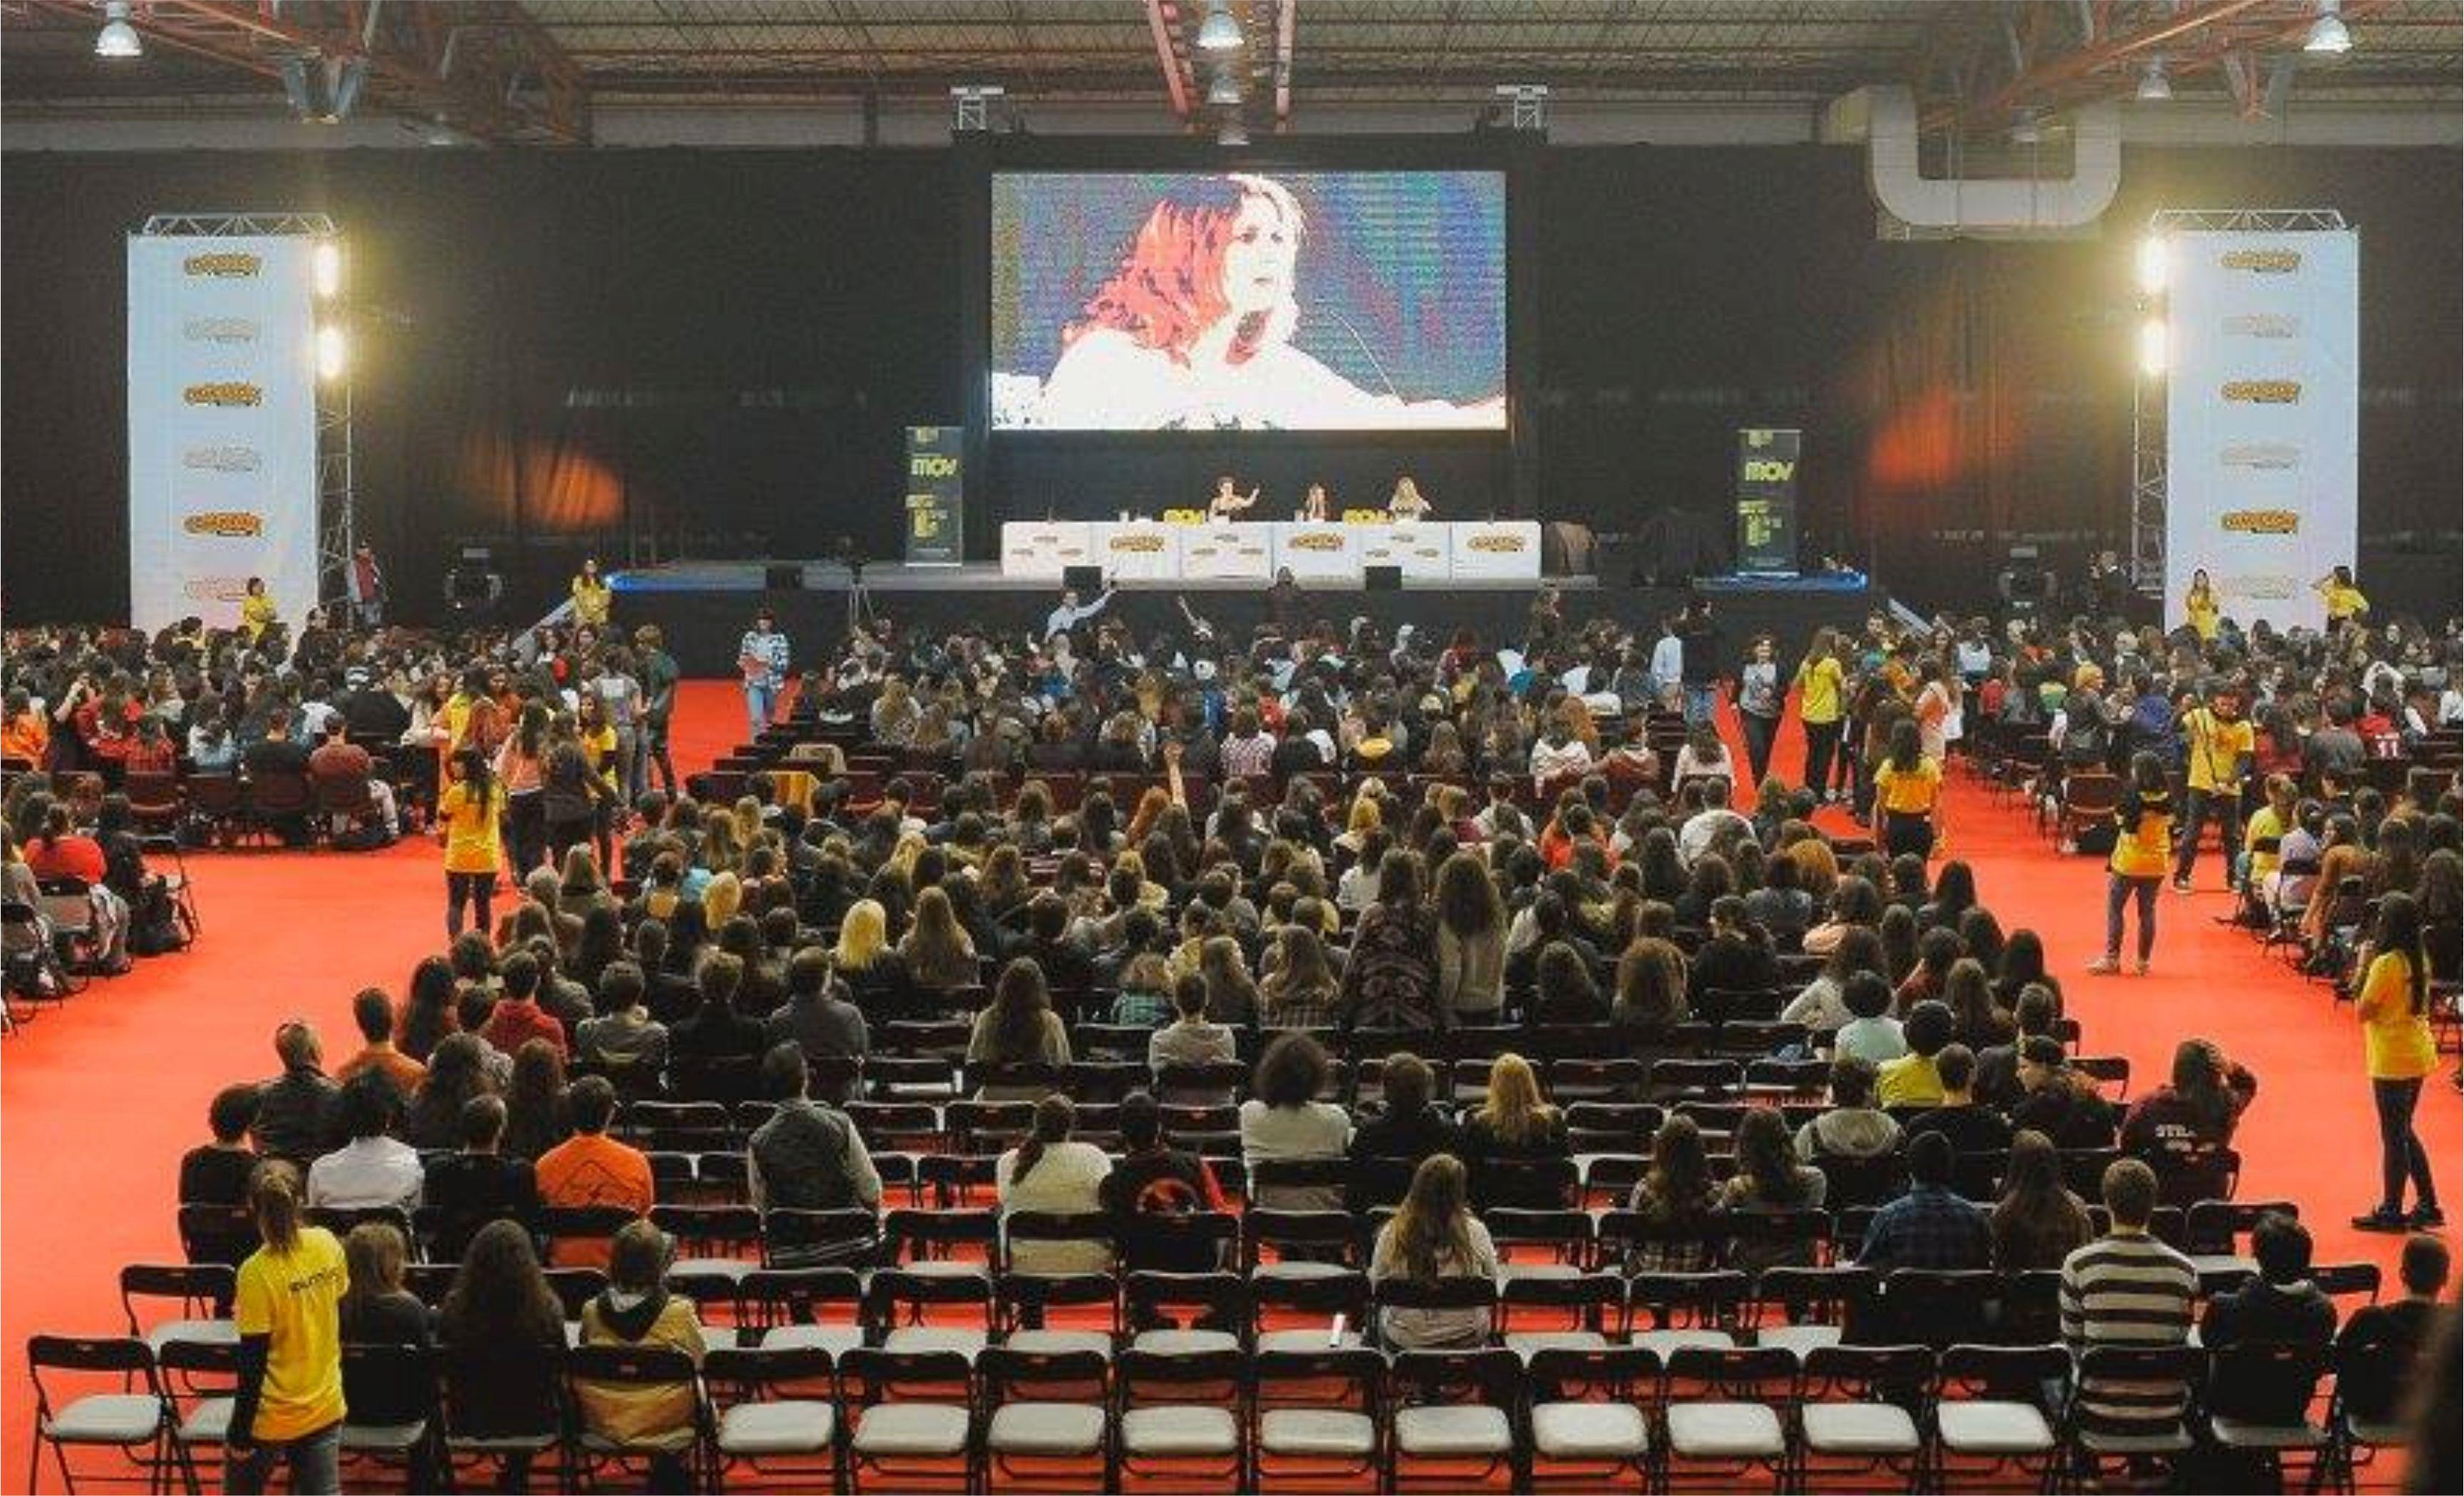 Международный фестиваль Comic Con в Порту http://travelcalendar.ru/wp-content/uploads/2015/08/Festival-Comic-Con-v-Porto_glav4.jpg